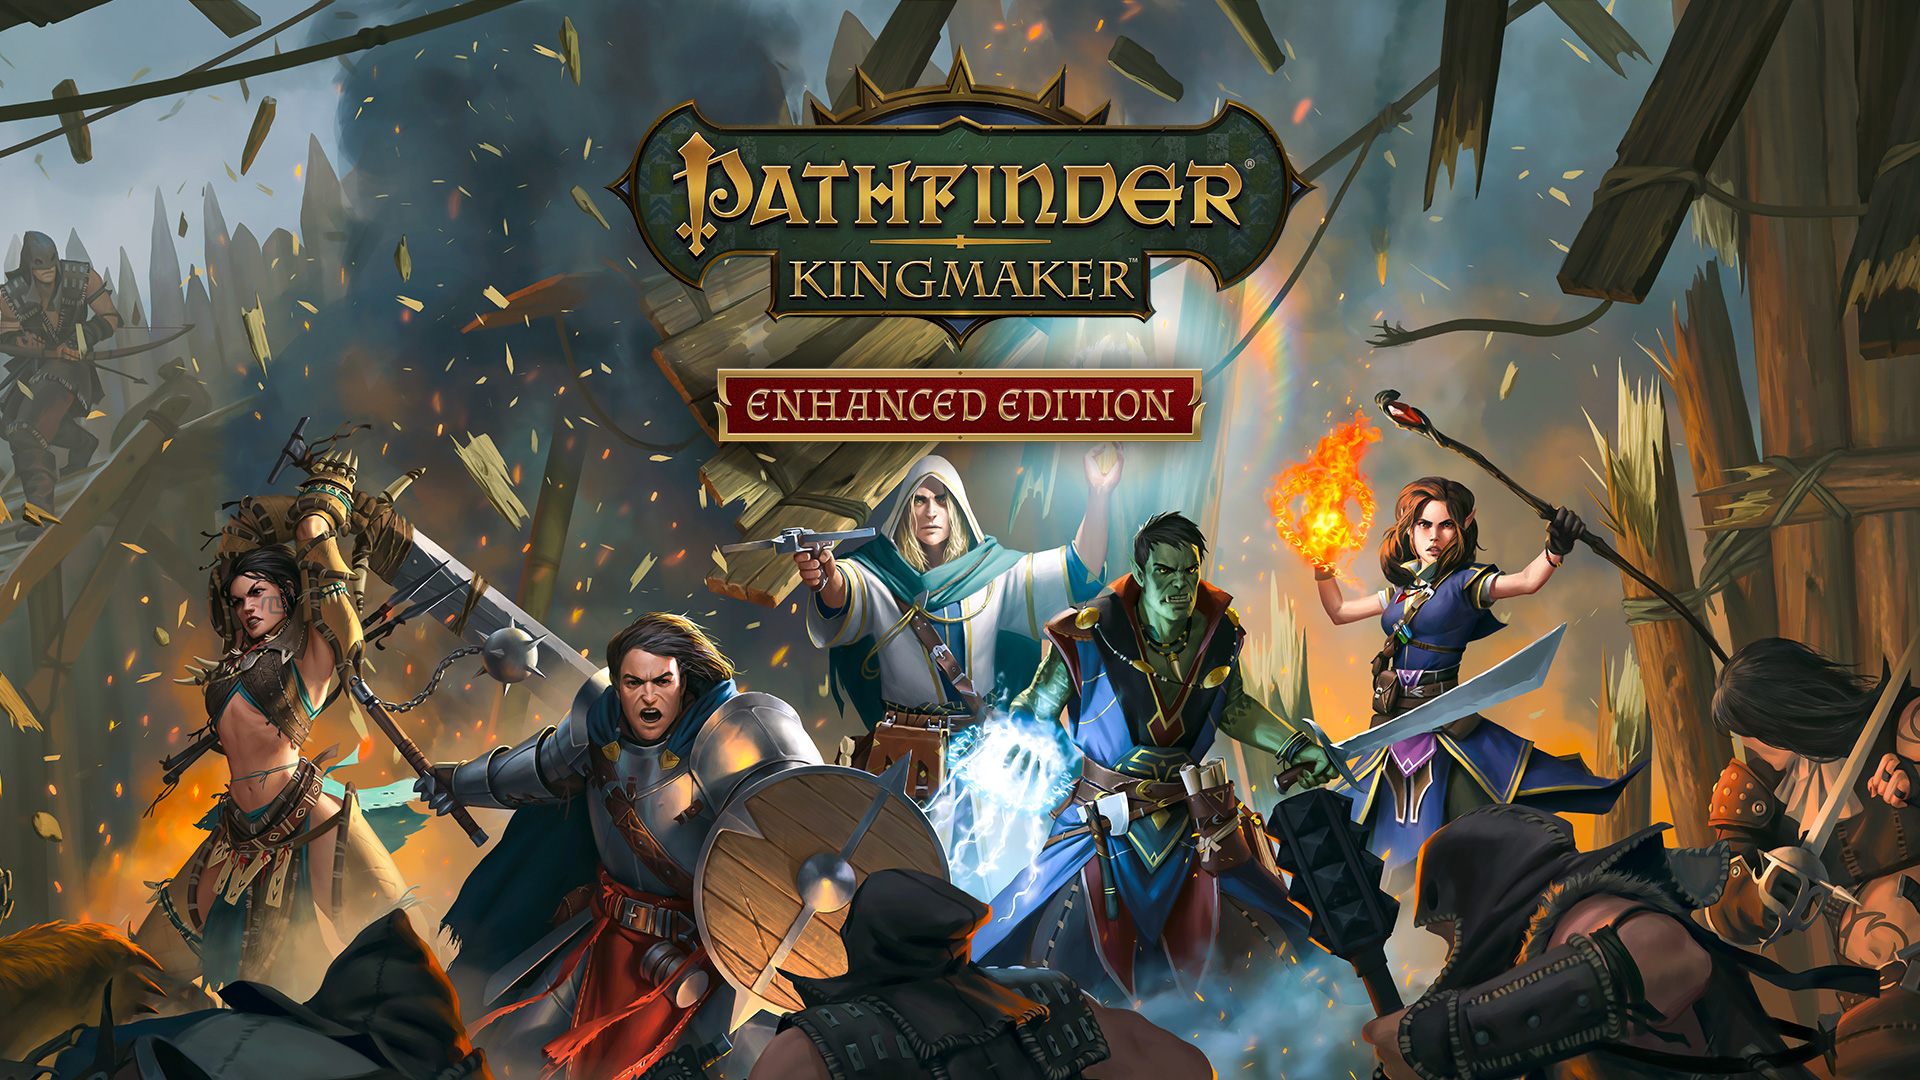 https://www.deepsilver.com/de/games/pathfinder-kingmaker-definitive-edition/